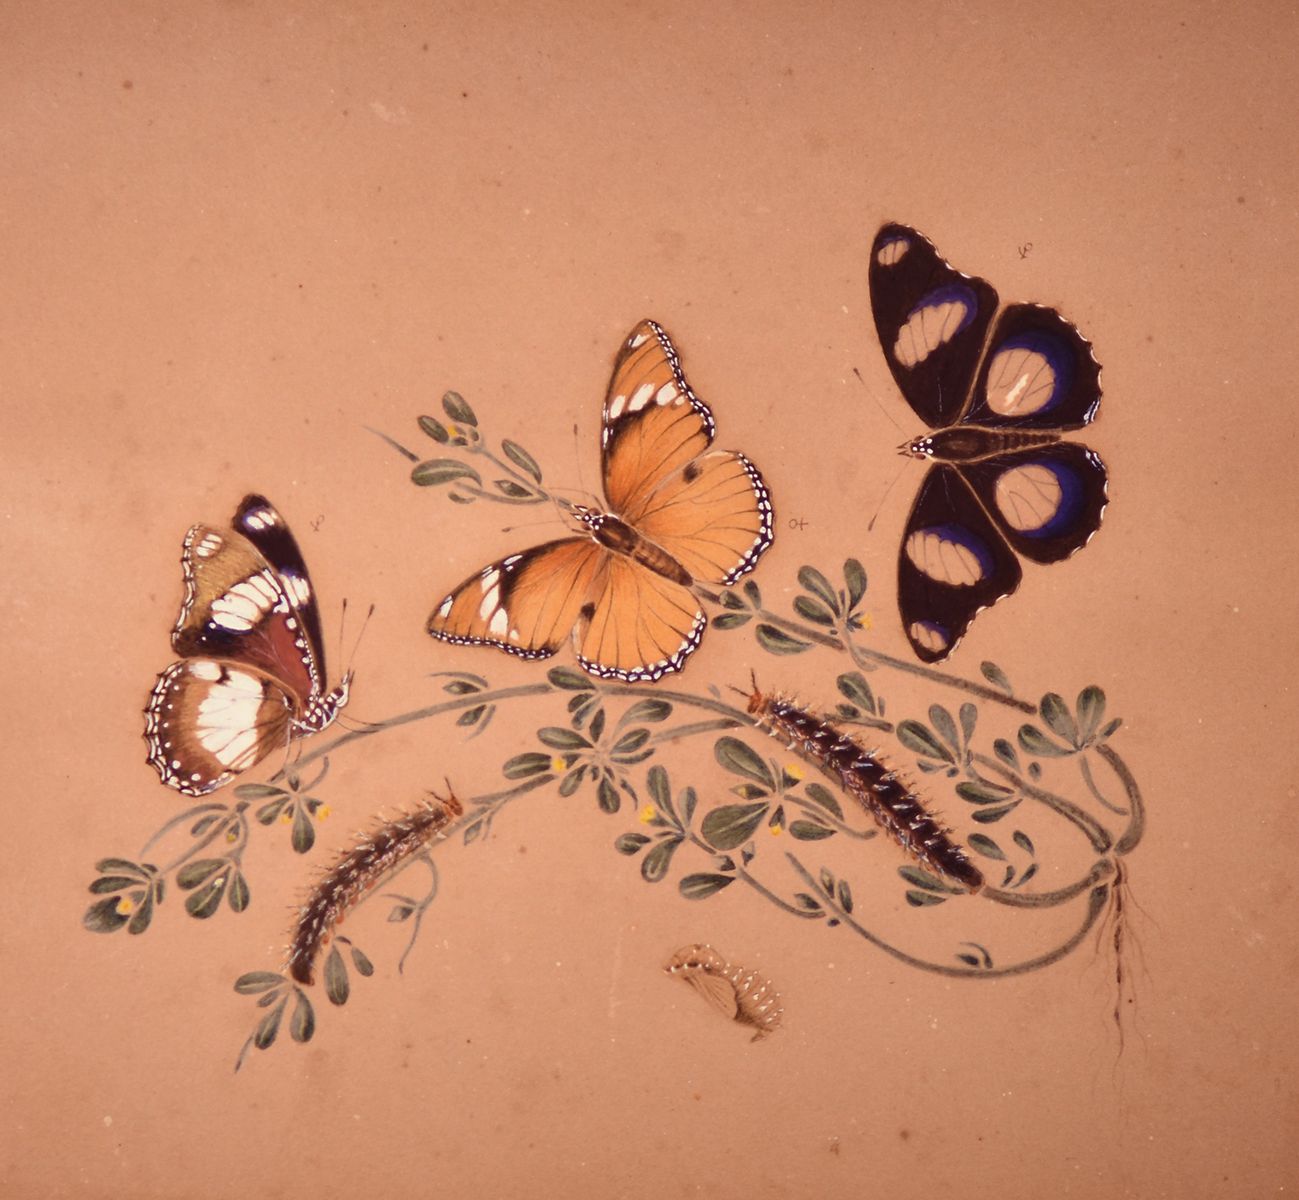 Illuminated Hide A Key Garden Animal Friend Butterfly Barbara King